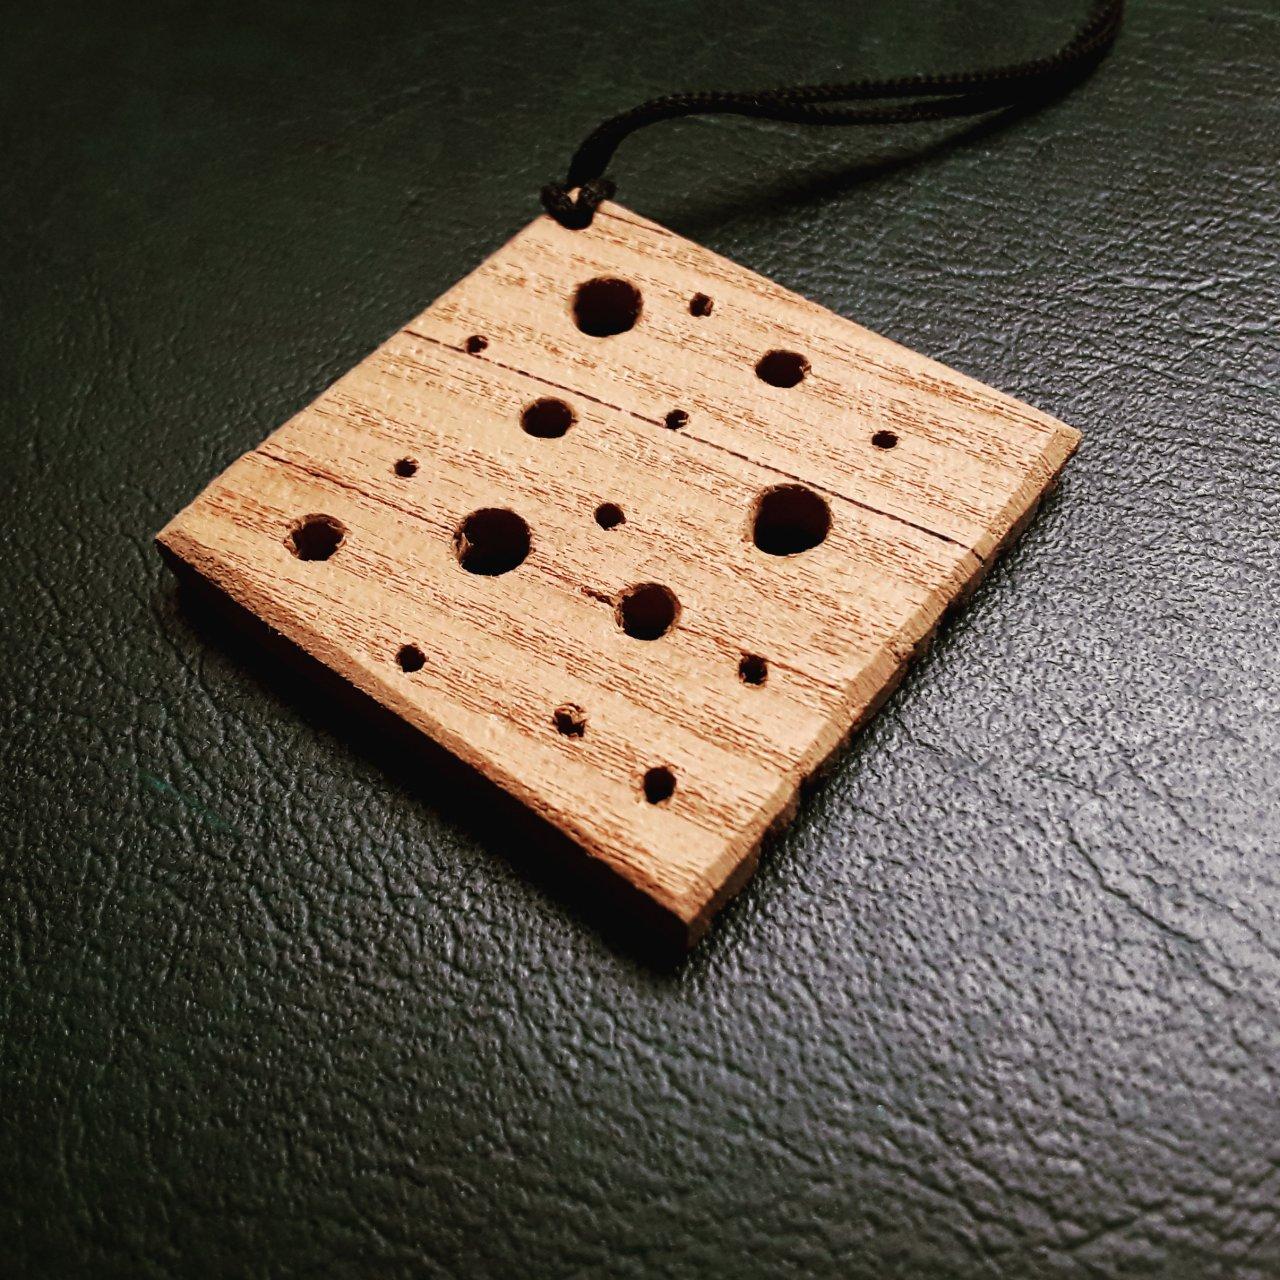 آویز گردنبند طرح پنیری